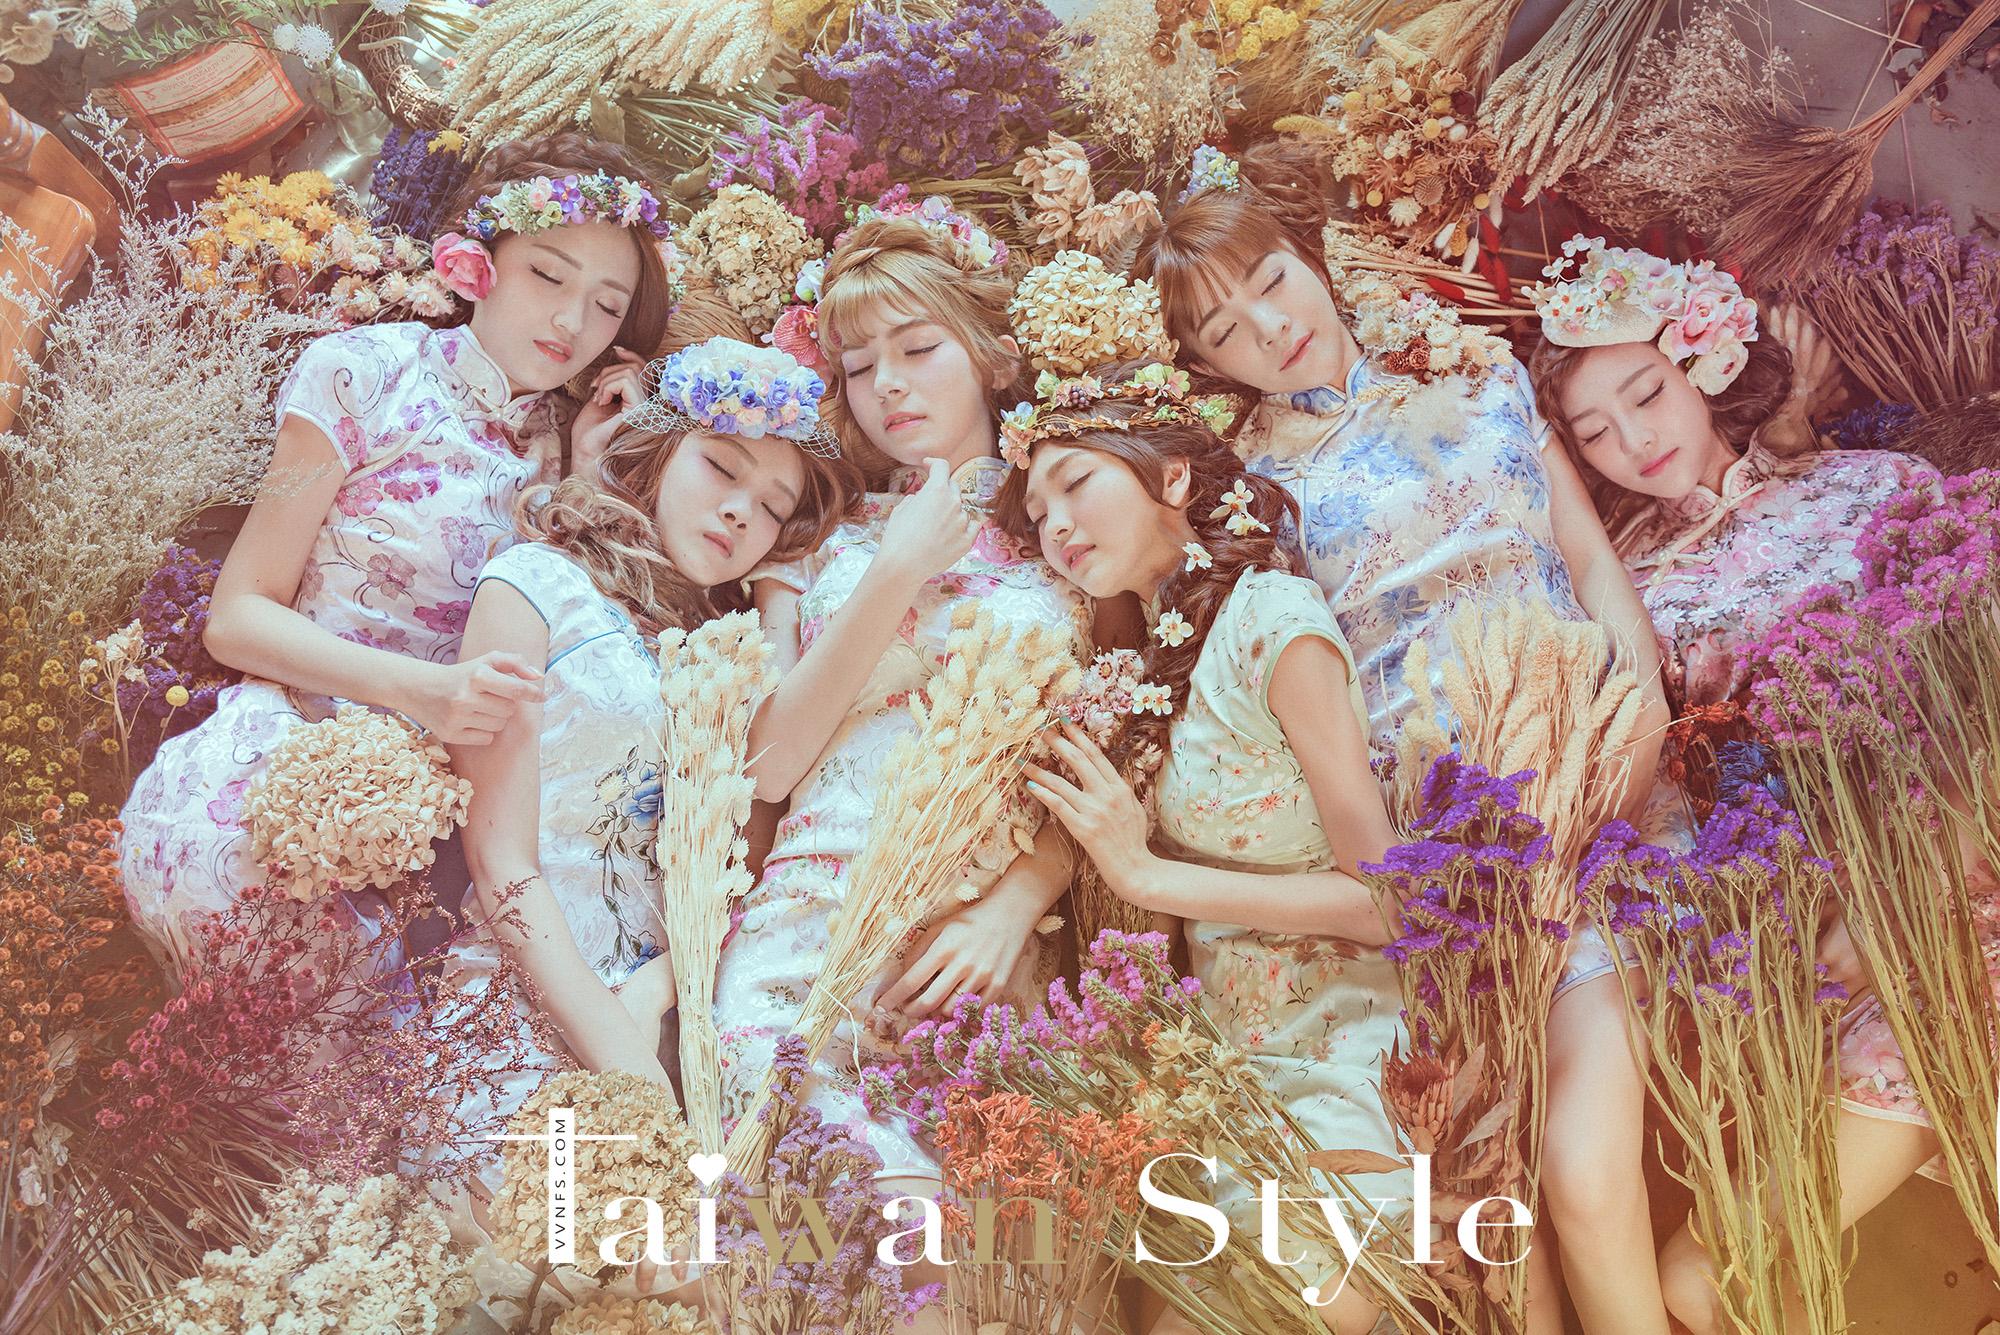 Taiwanstyle旗袍創作台南大合拍VVNFS1縮圖logo